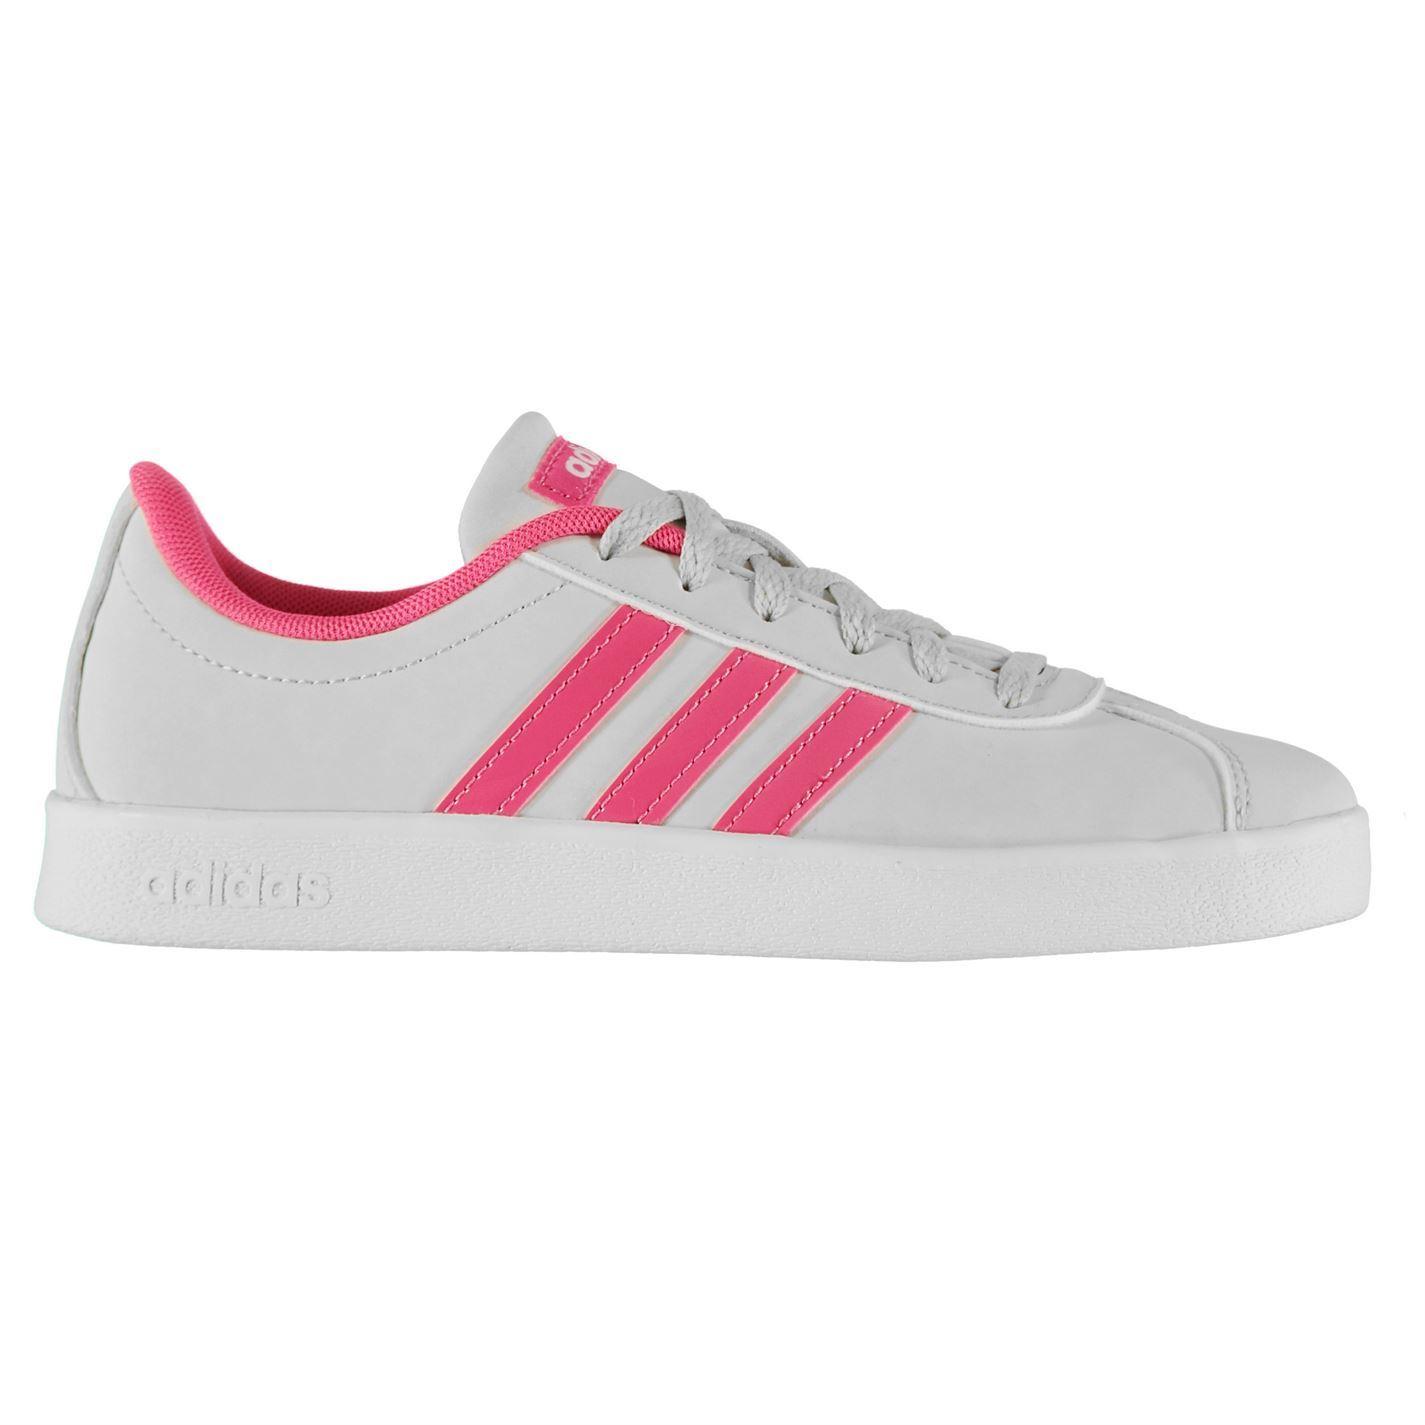 c359923cfa848d ... adidas VL Court 2 K Trainer Girls Grey Pink Shoes Footwear ...